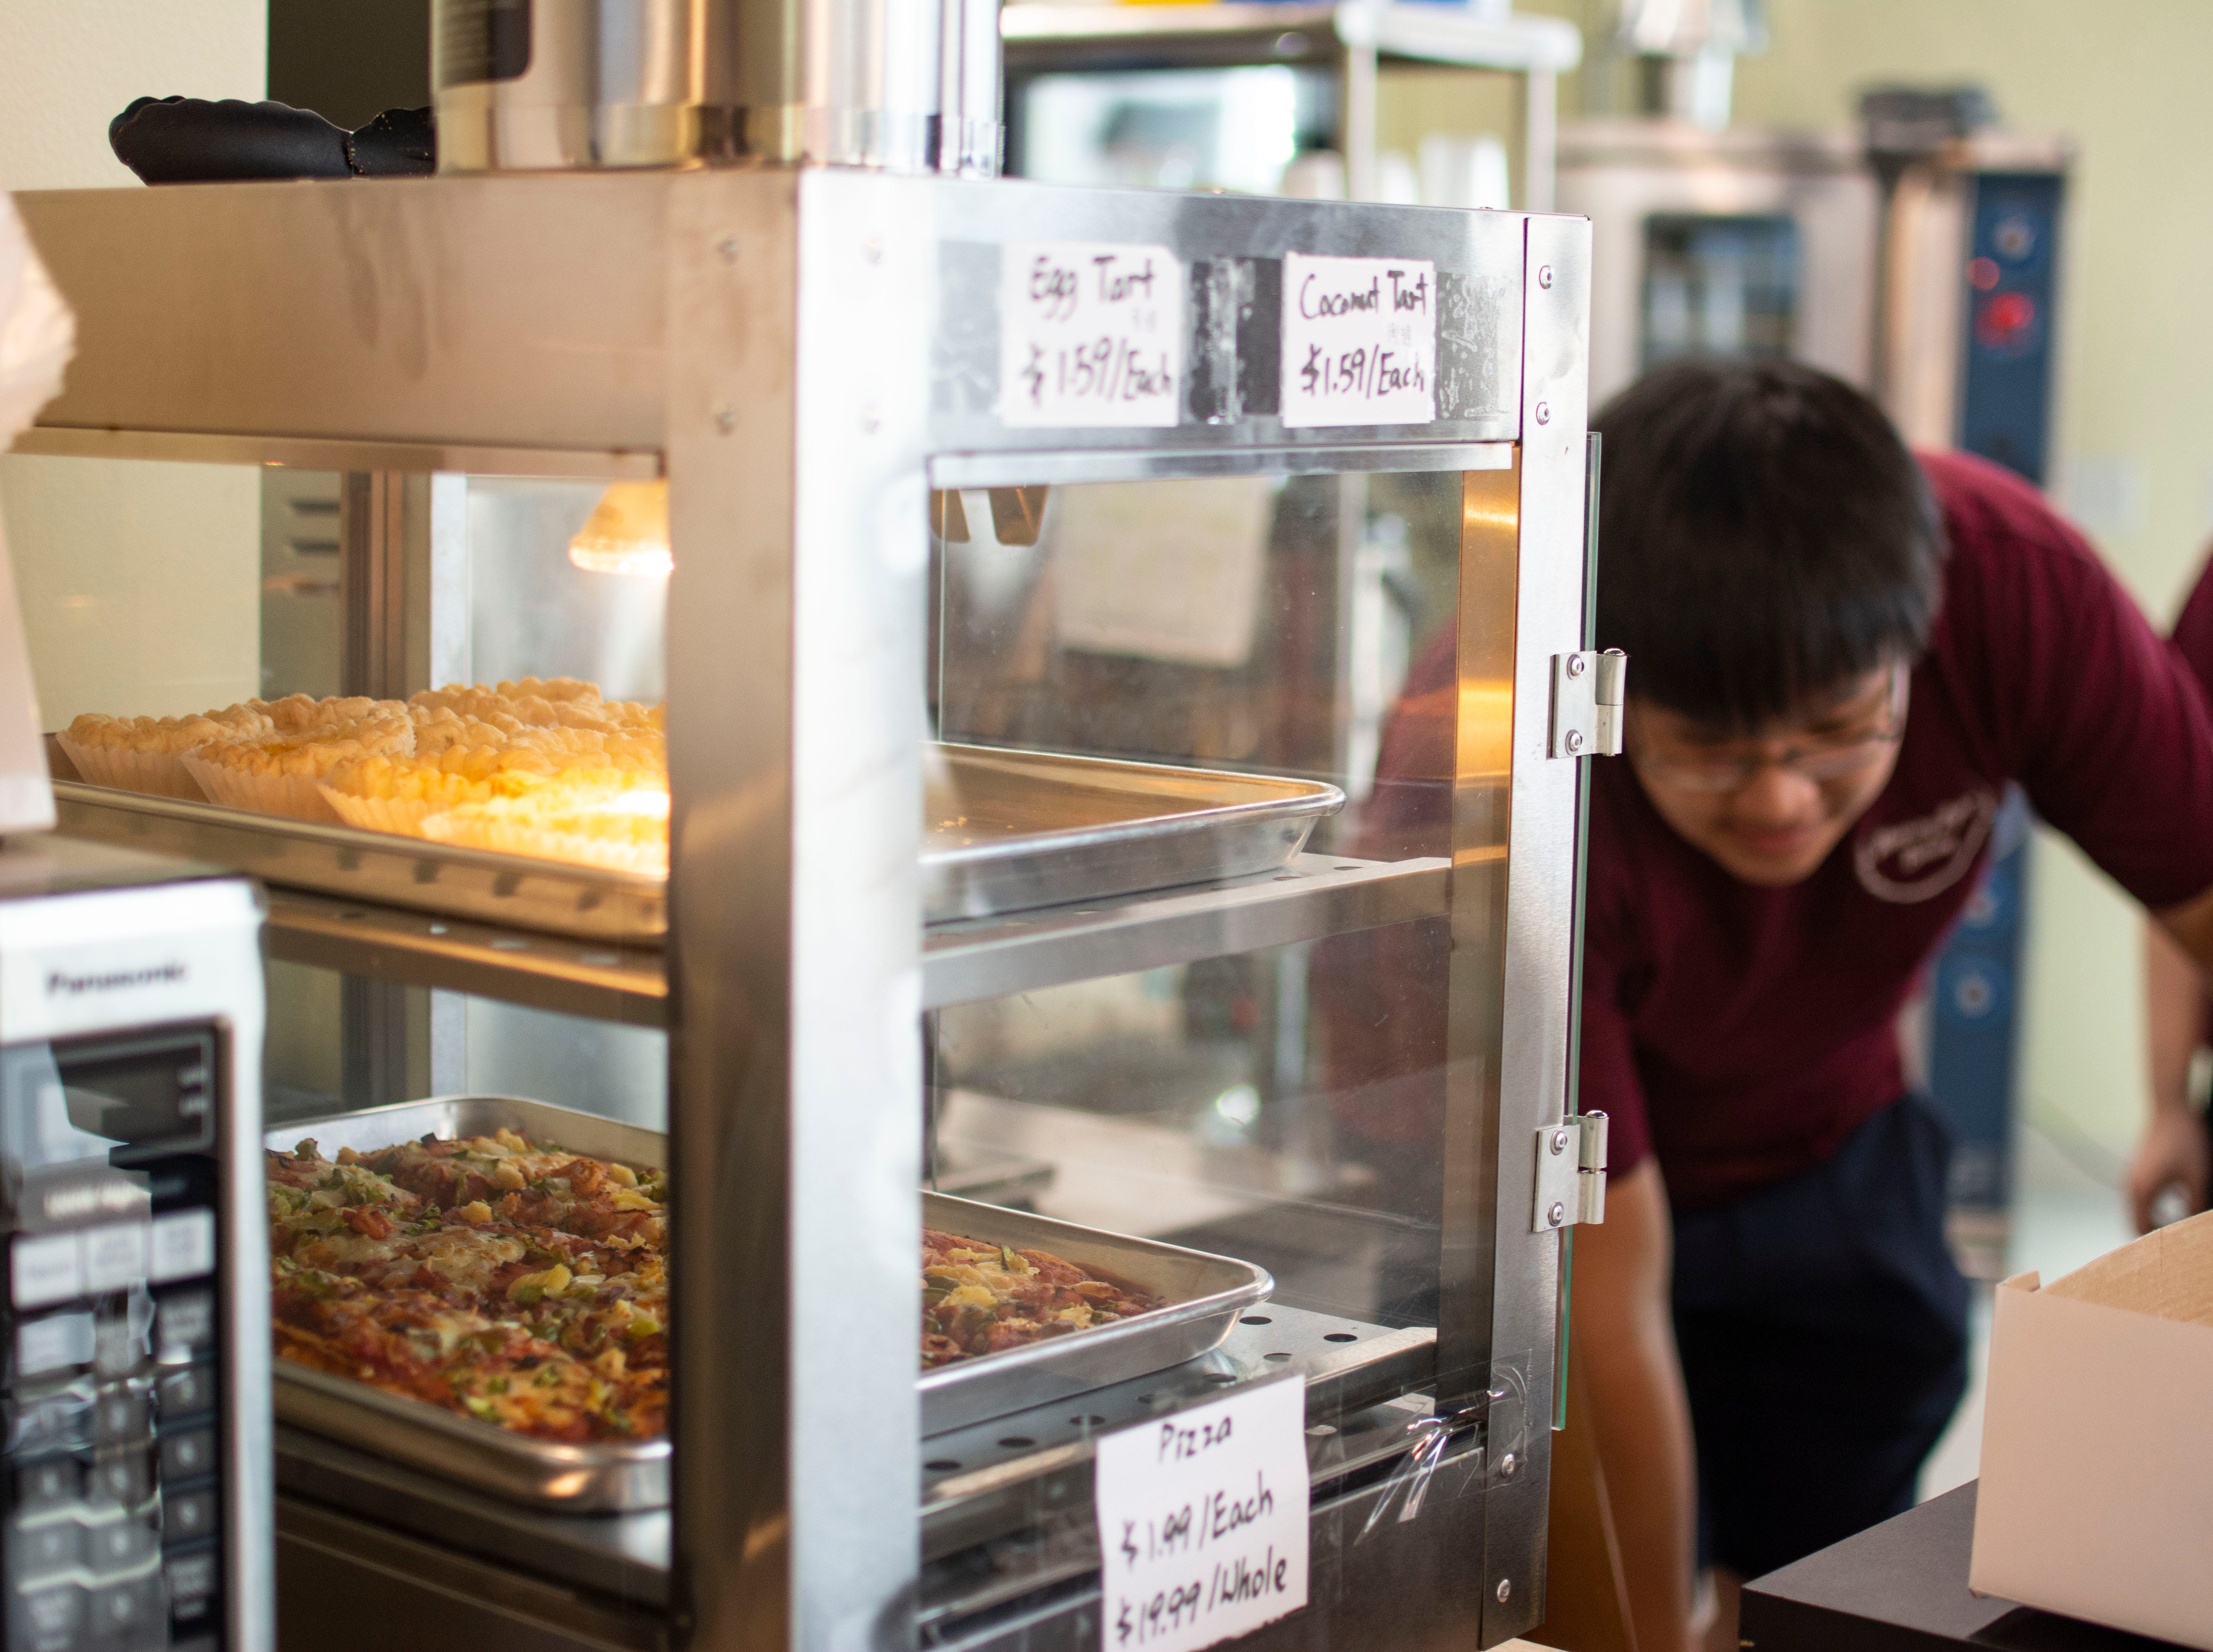 Morning Light bakery also serves slices of pizza